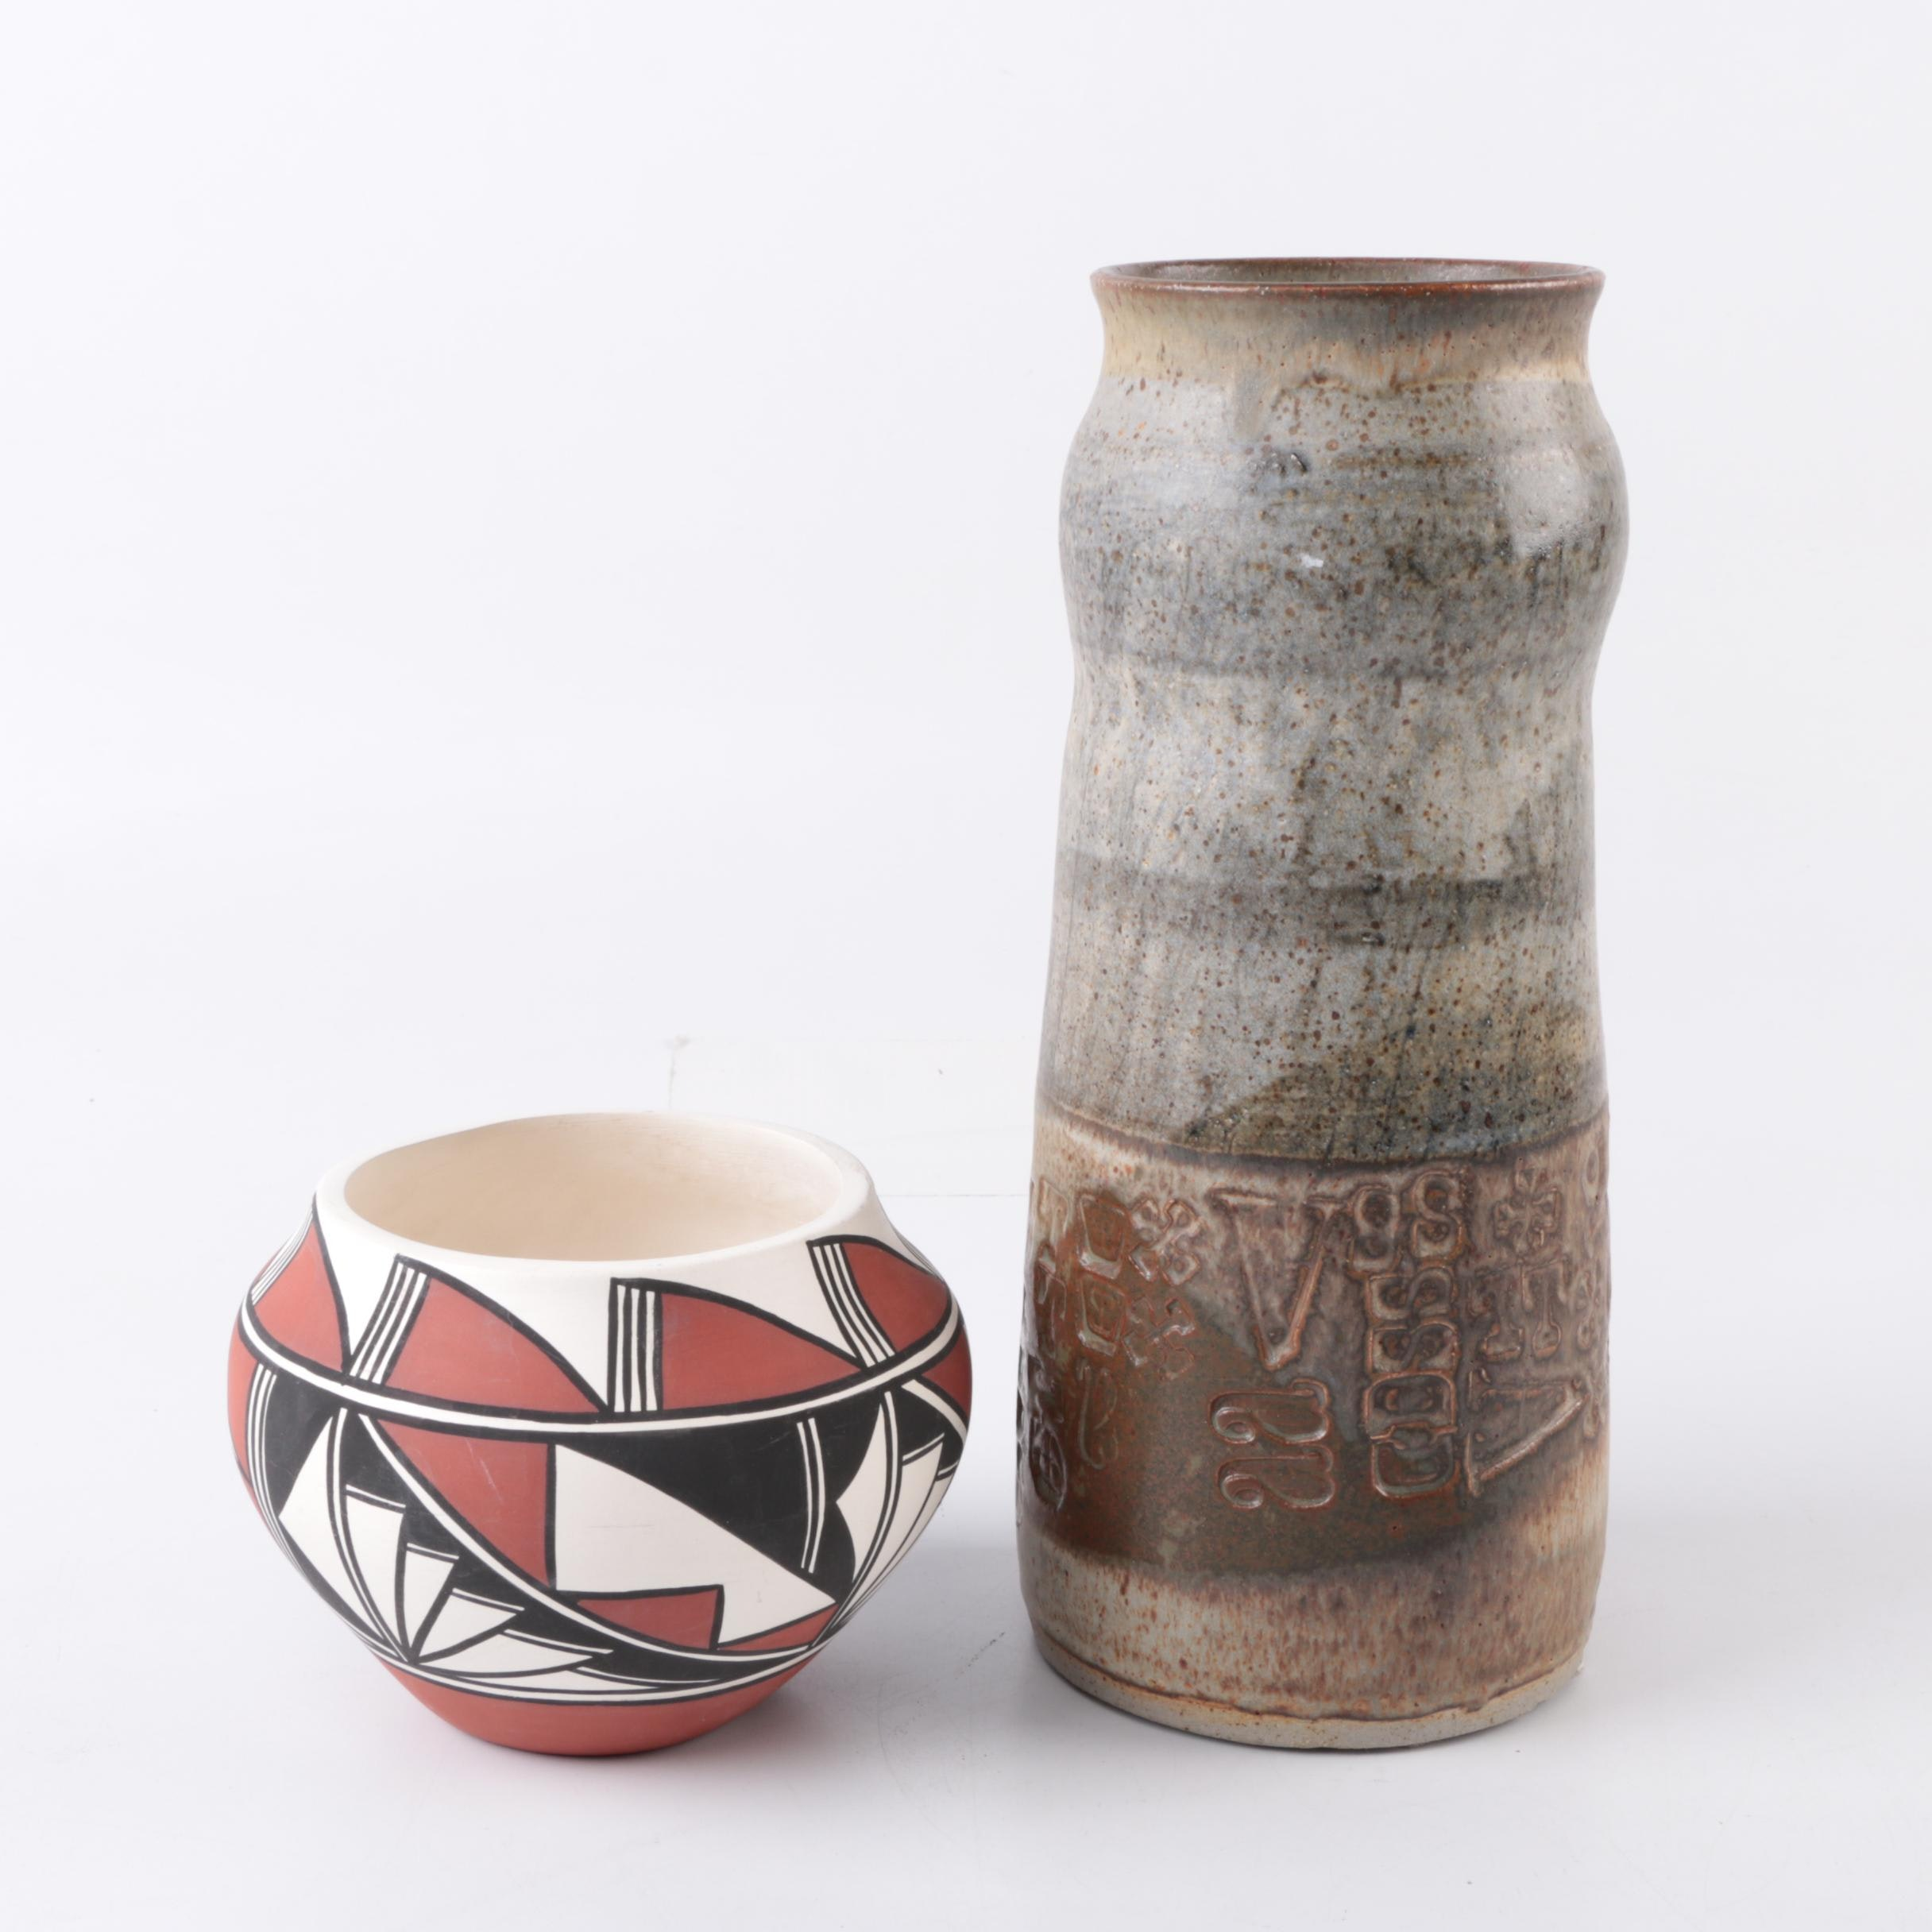 Sanchez Acoma and Hand Thrown Stoneware Vases